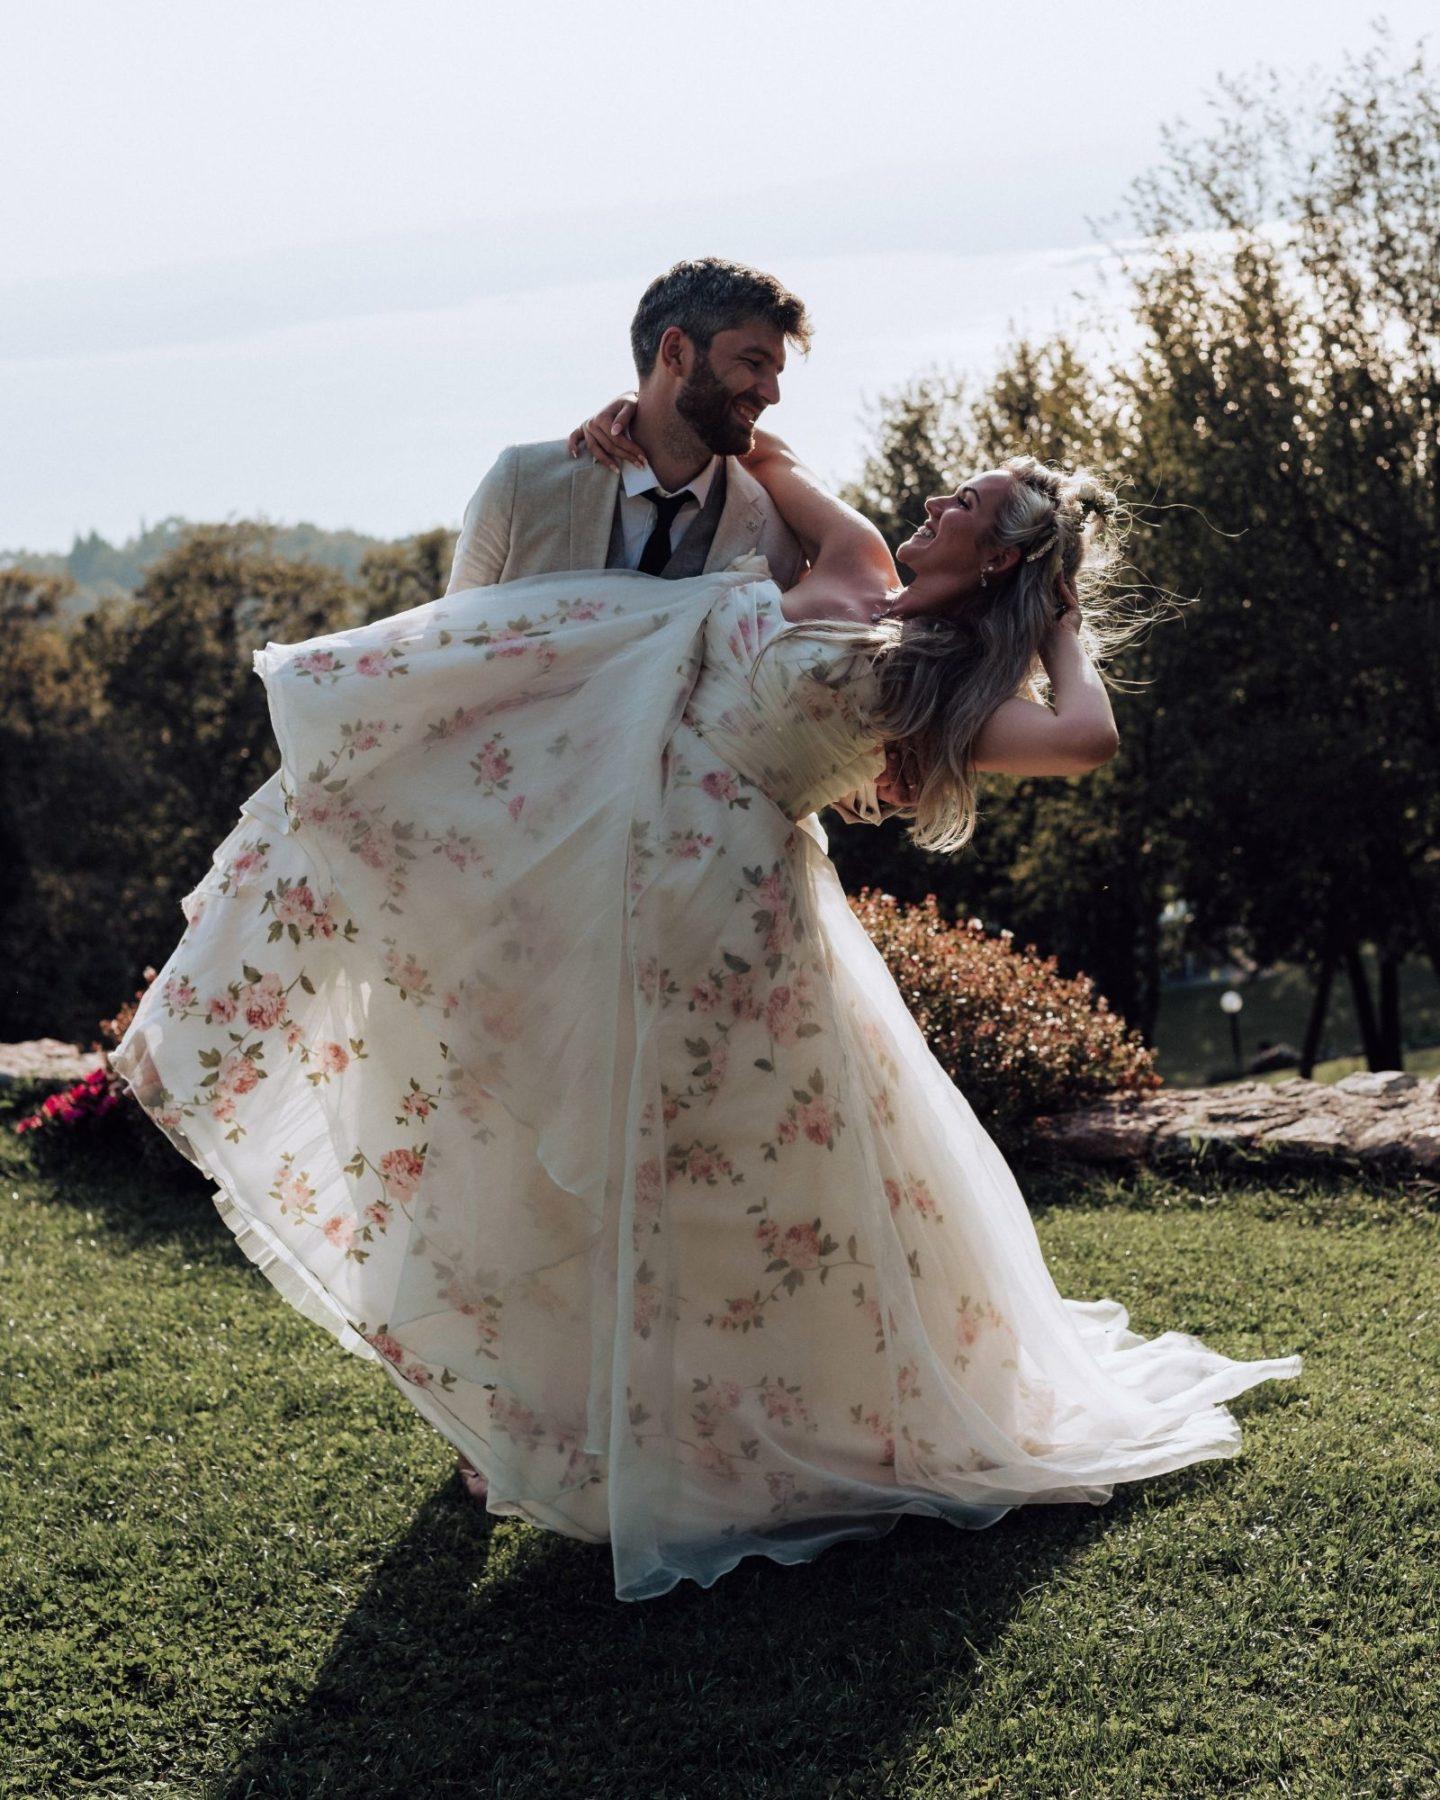 Vintage boho wedding dress with roses